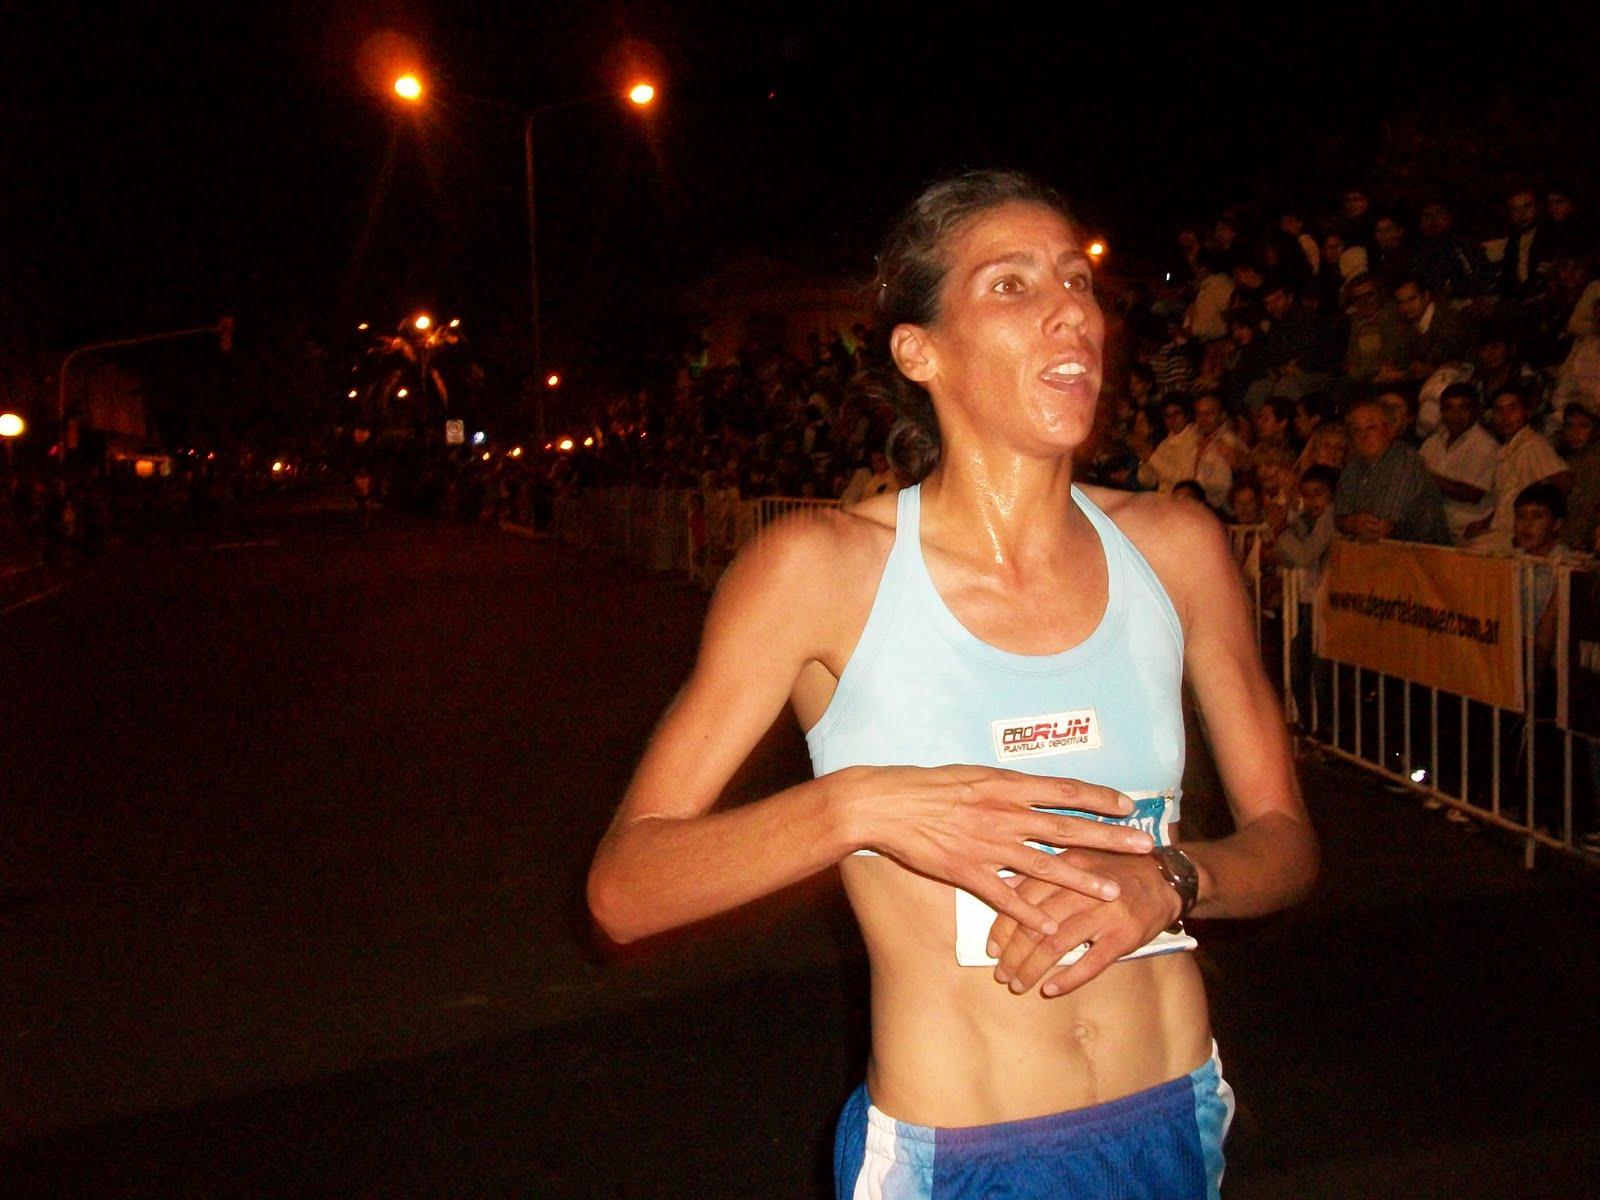 Atleta Argentina Raquel Maraviglia